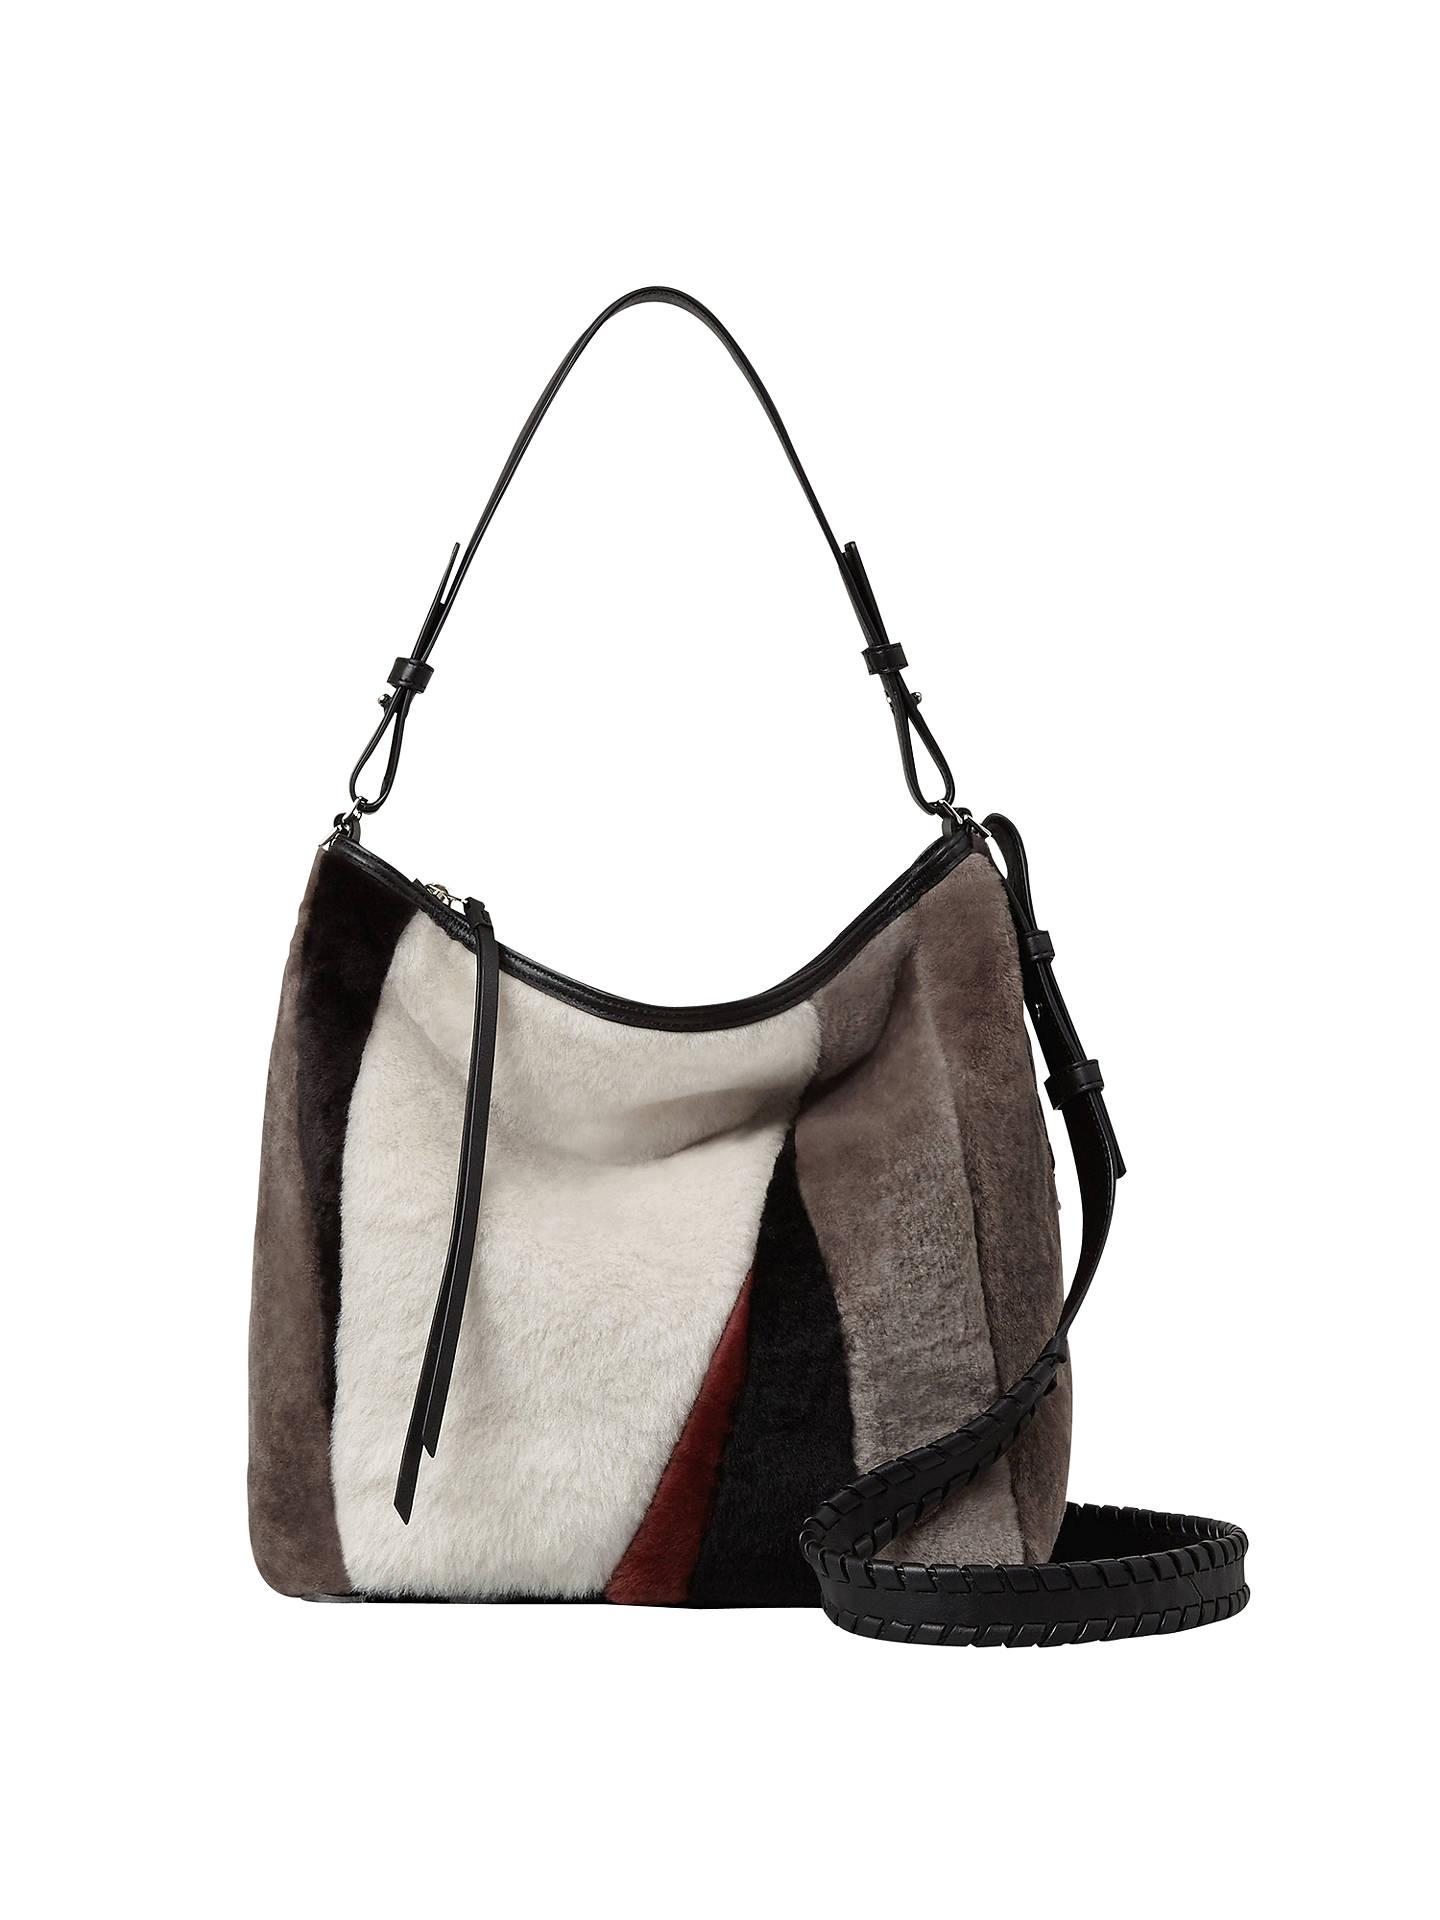 4a0d3334c7 Buy AllSaints Kita Crossbody Bag, Natural White Online at johnlewis.com ...